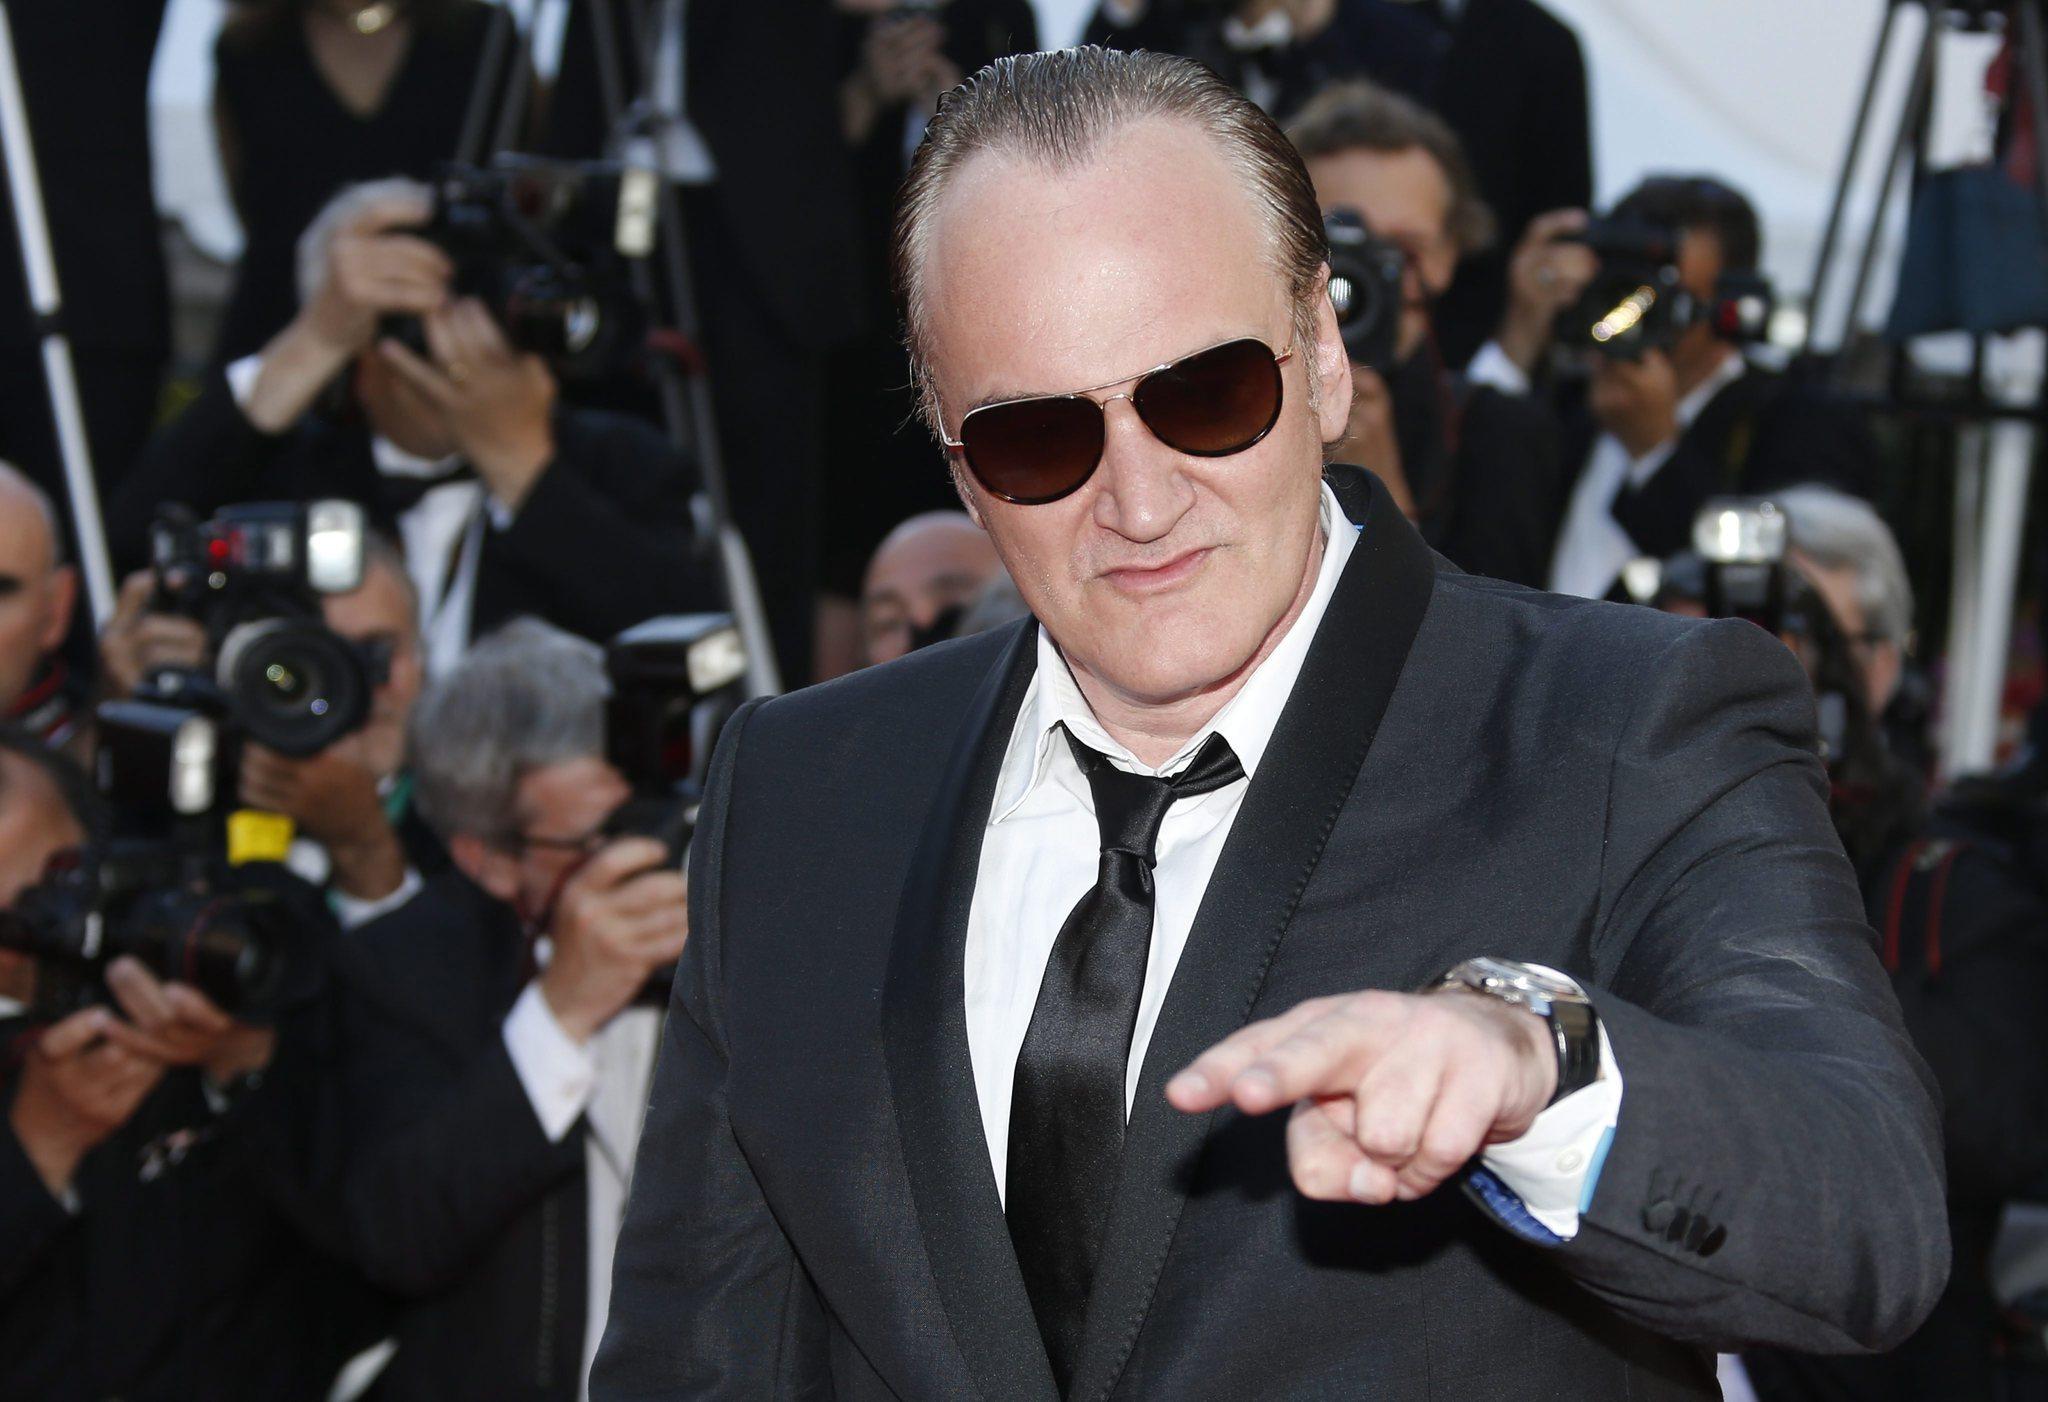 Quentin Tarantino The Hateful 8